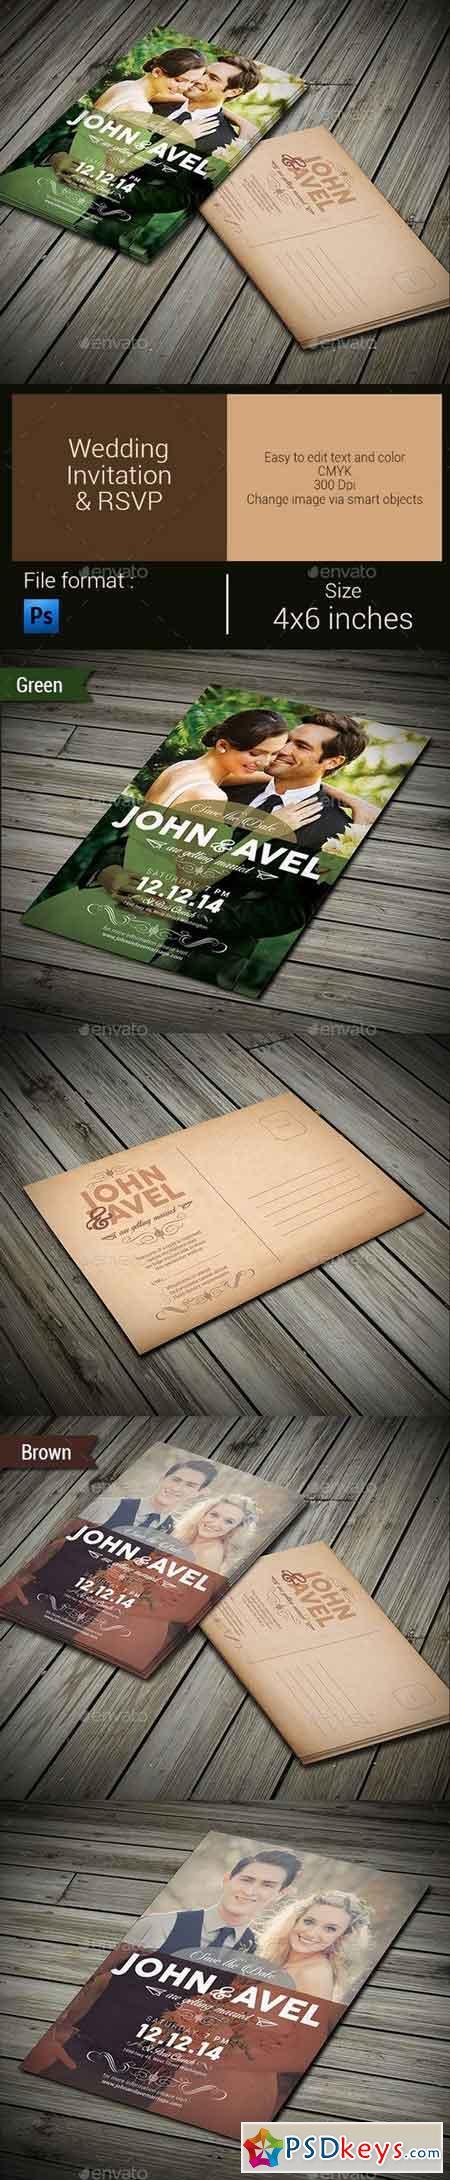 Wedding Invitation & RSVP 9665213